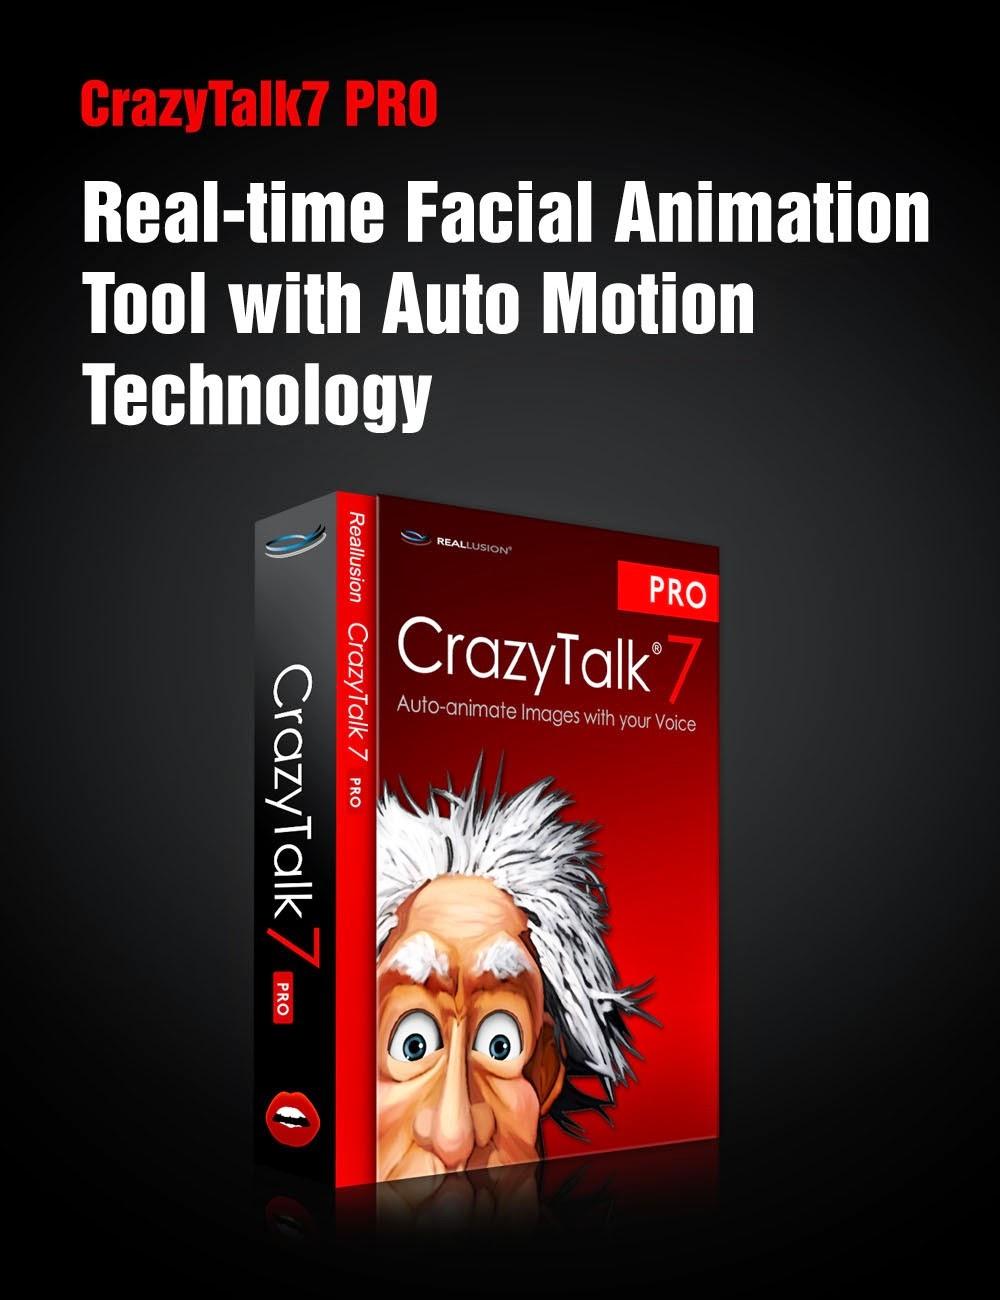 CrazyTalk7 PRO